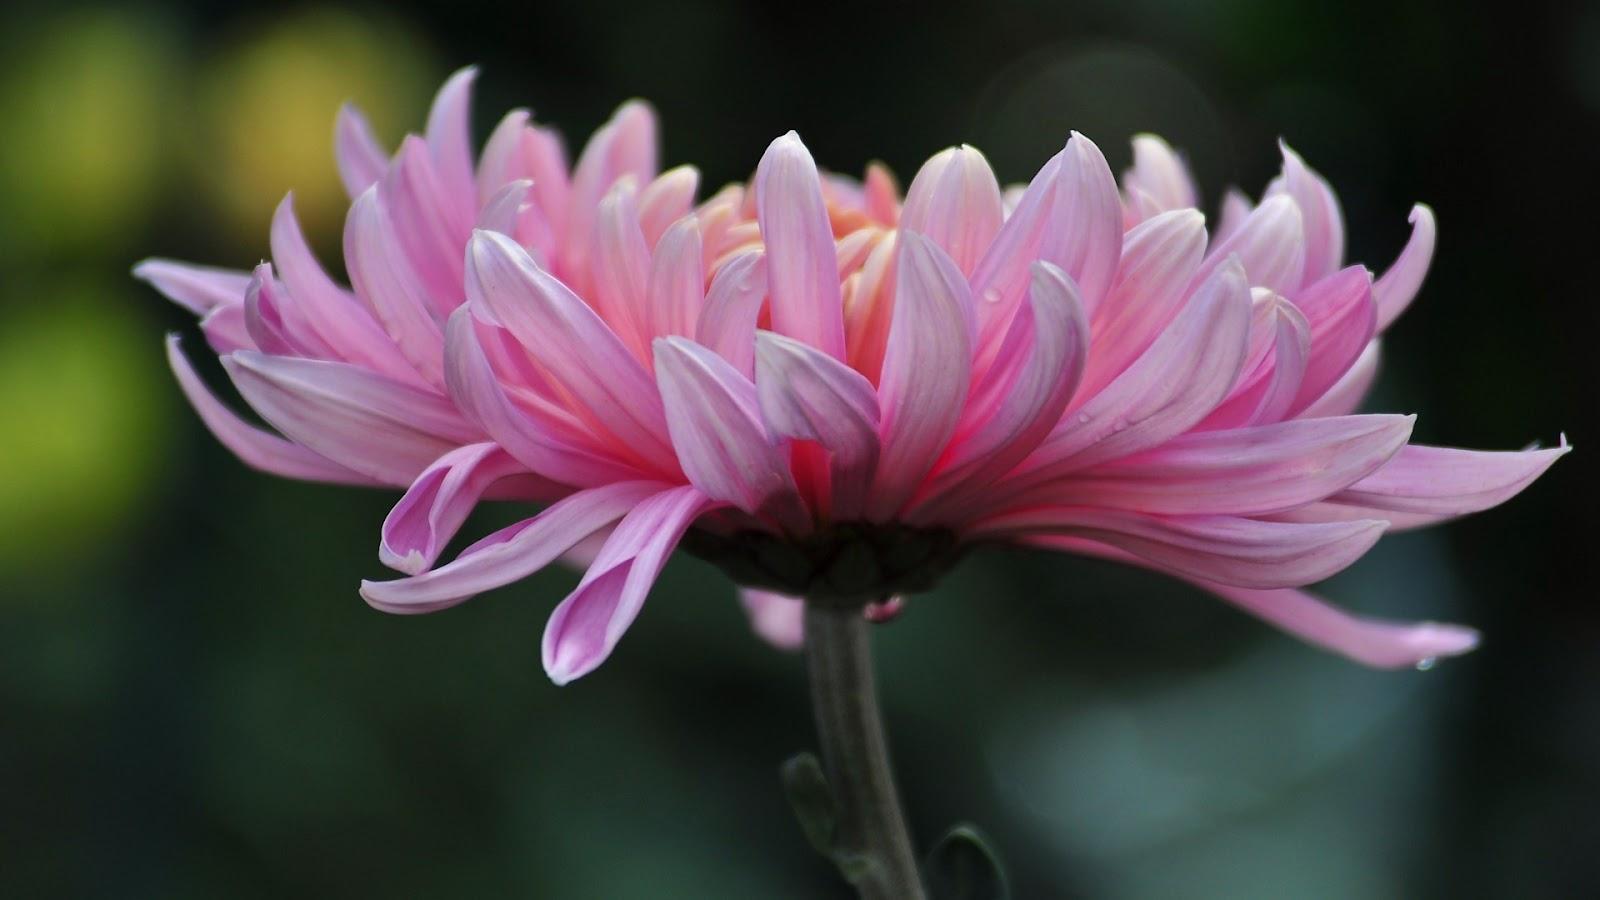 http://2.bp.blogspot.com/-DexonE5eokE/T0KLBpVD8zI/AAAAAAAAA0A/w8KD6LvWFxM/s1600/Floral+HD+wallpaper.jpg